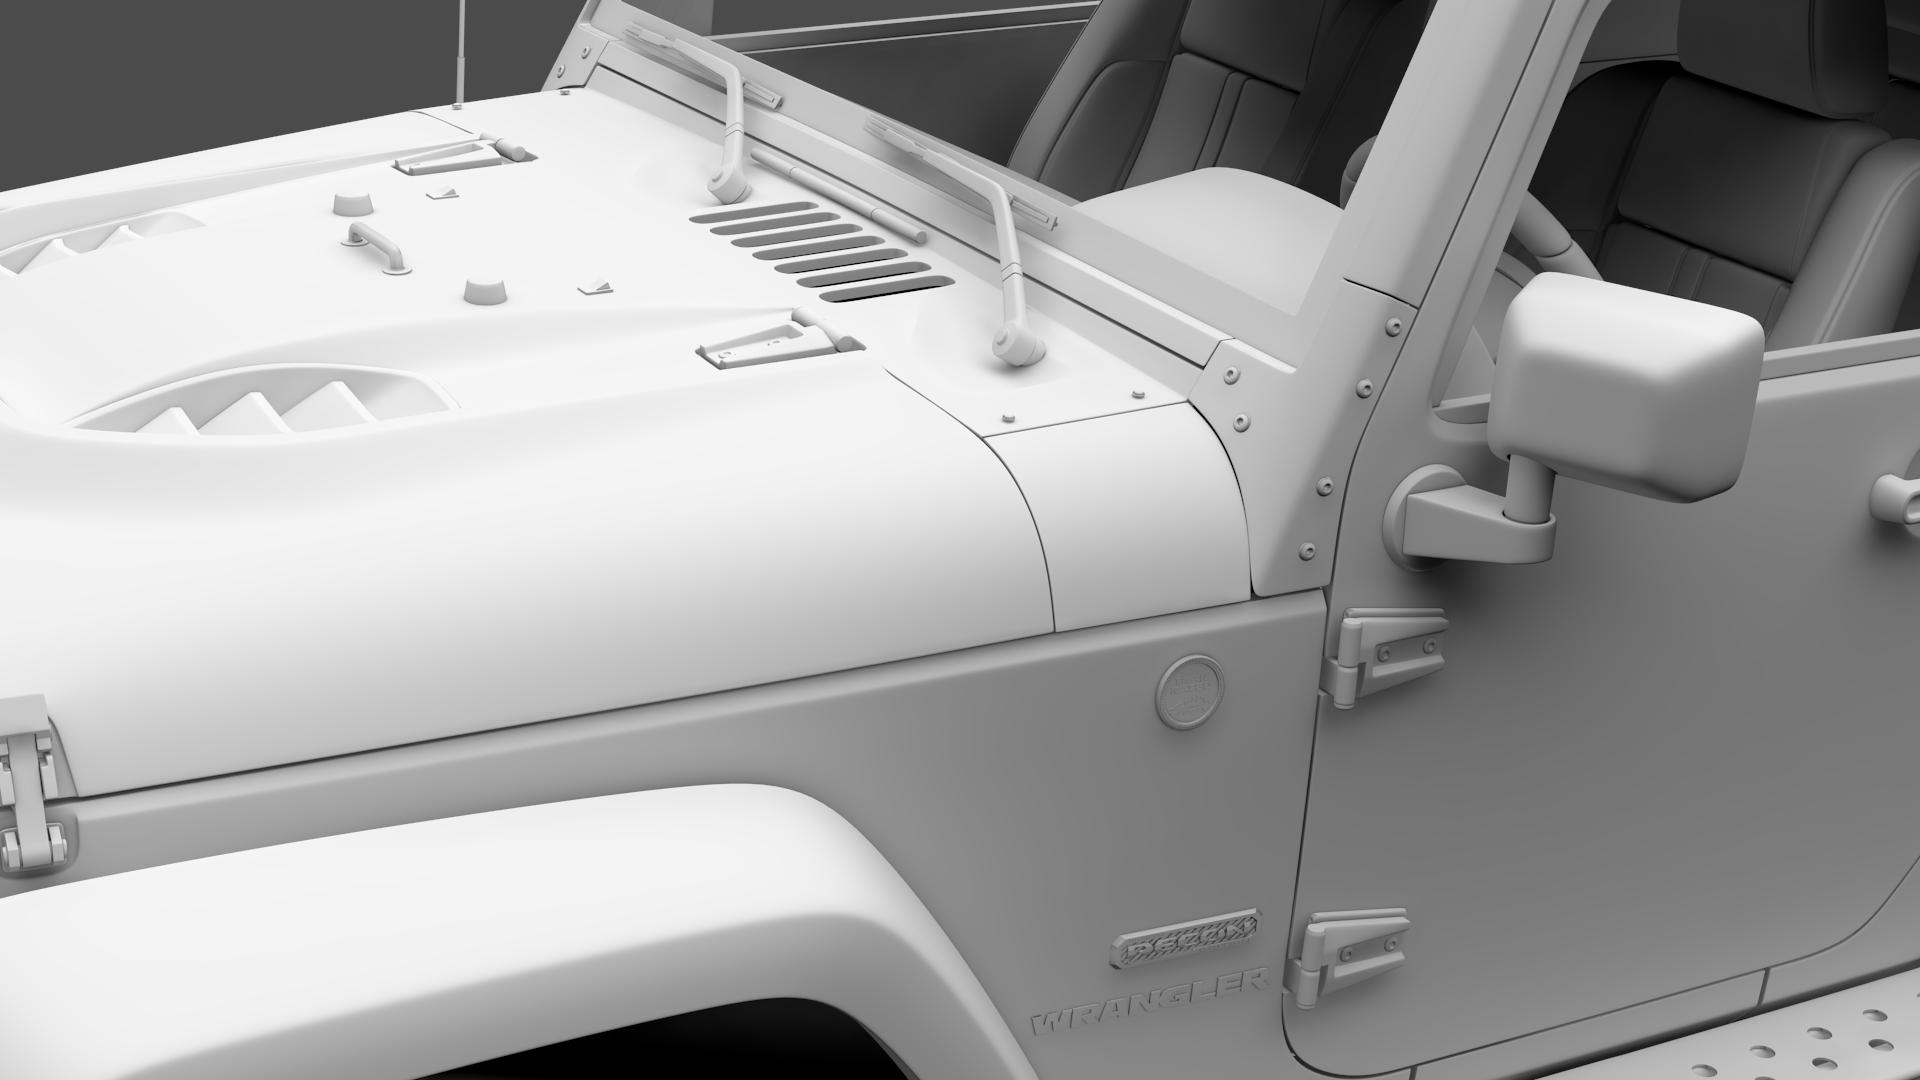 jeep wrangler crawler rubicon recon jk 2017 3d model max fbx c4d lwo ma mb hrc xsi obj 276927